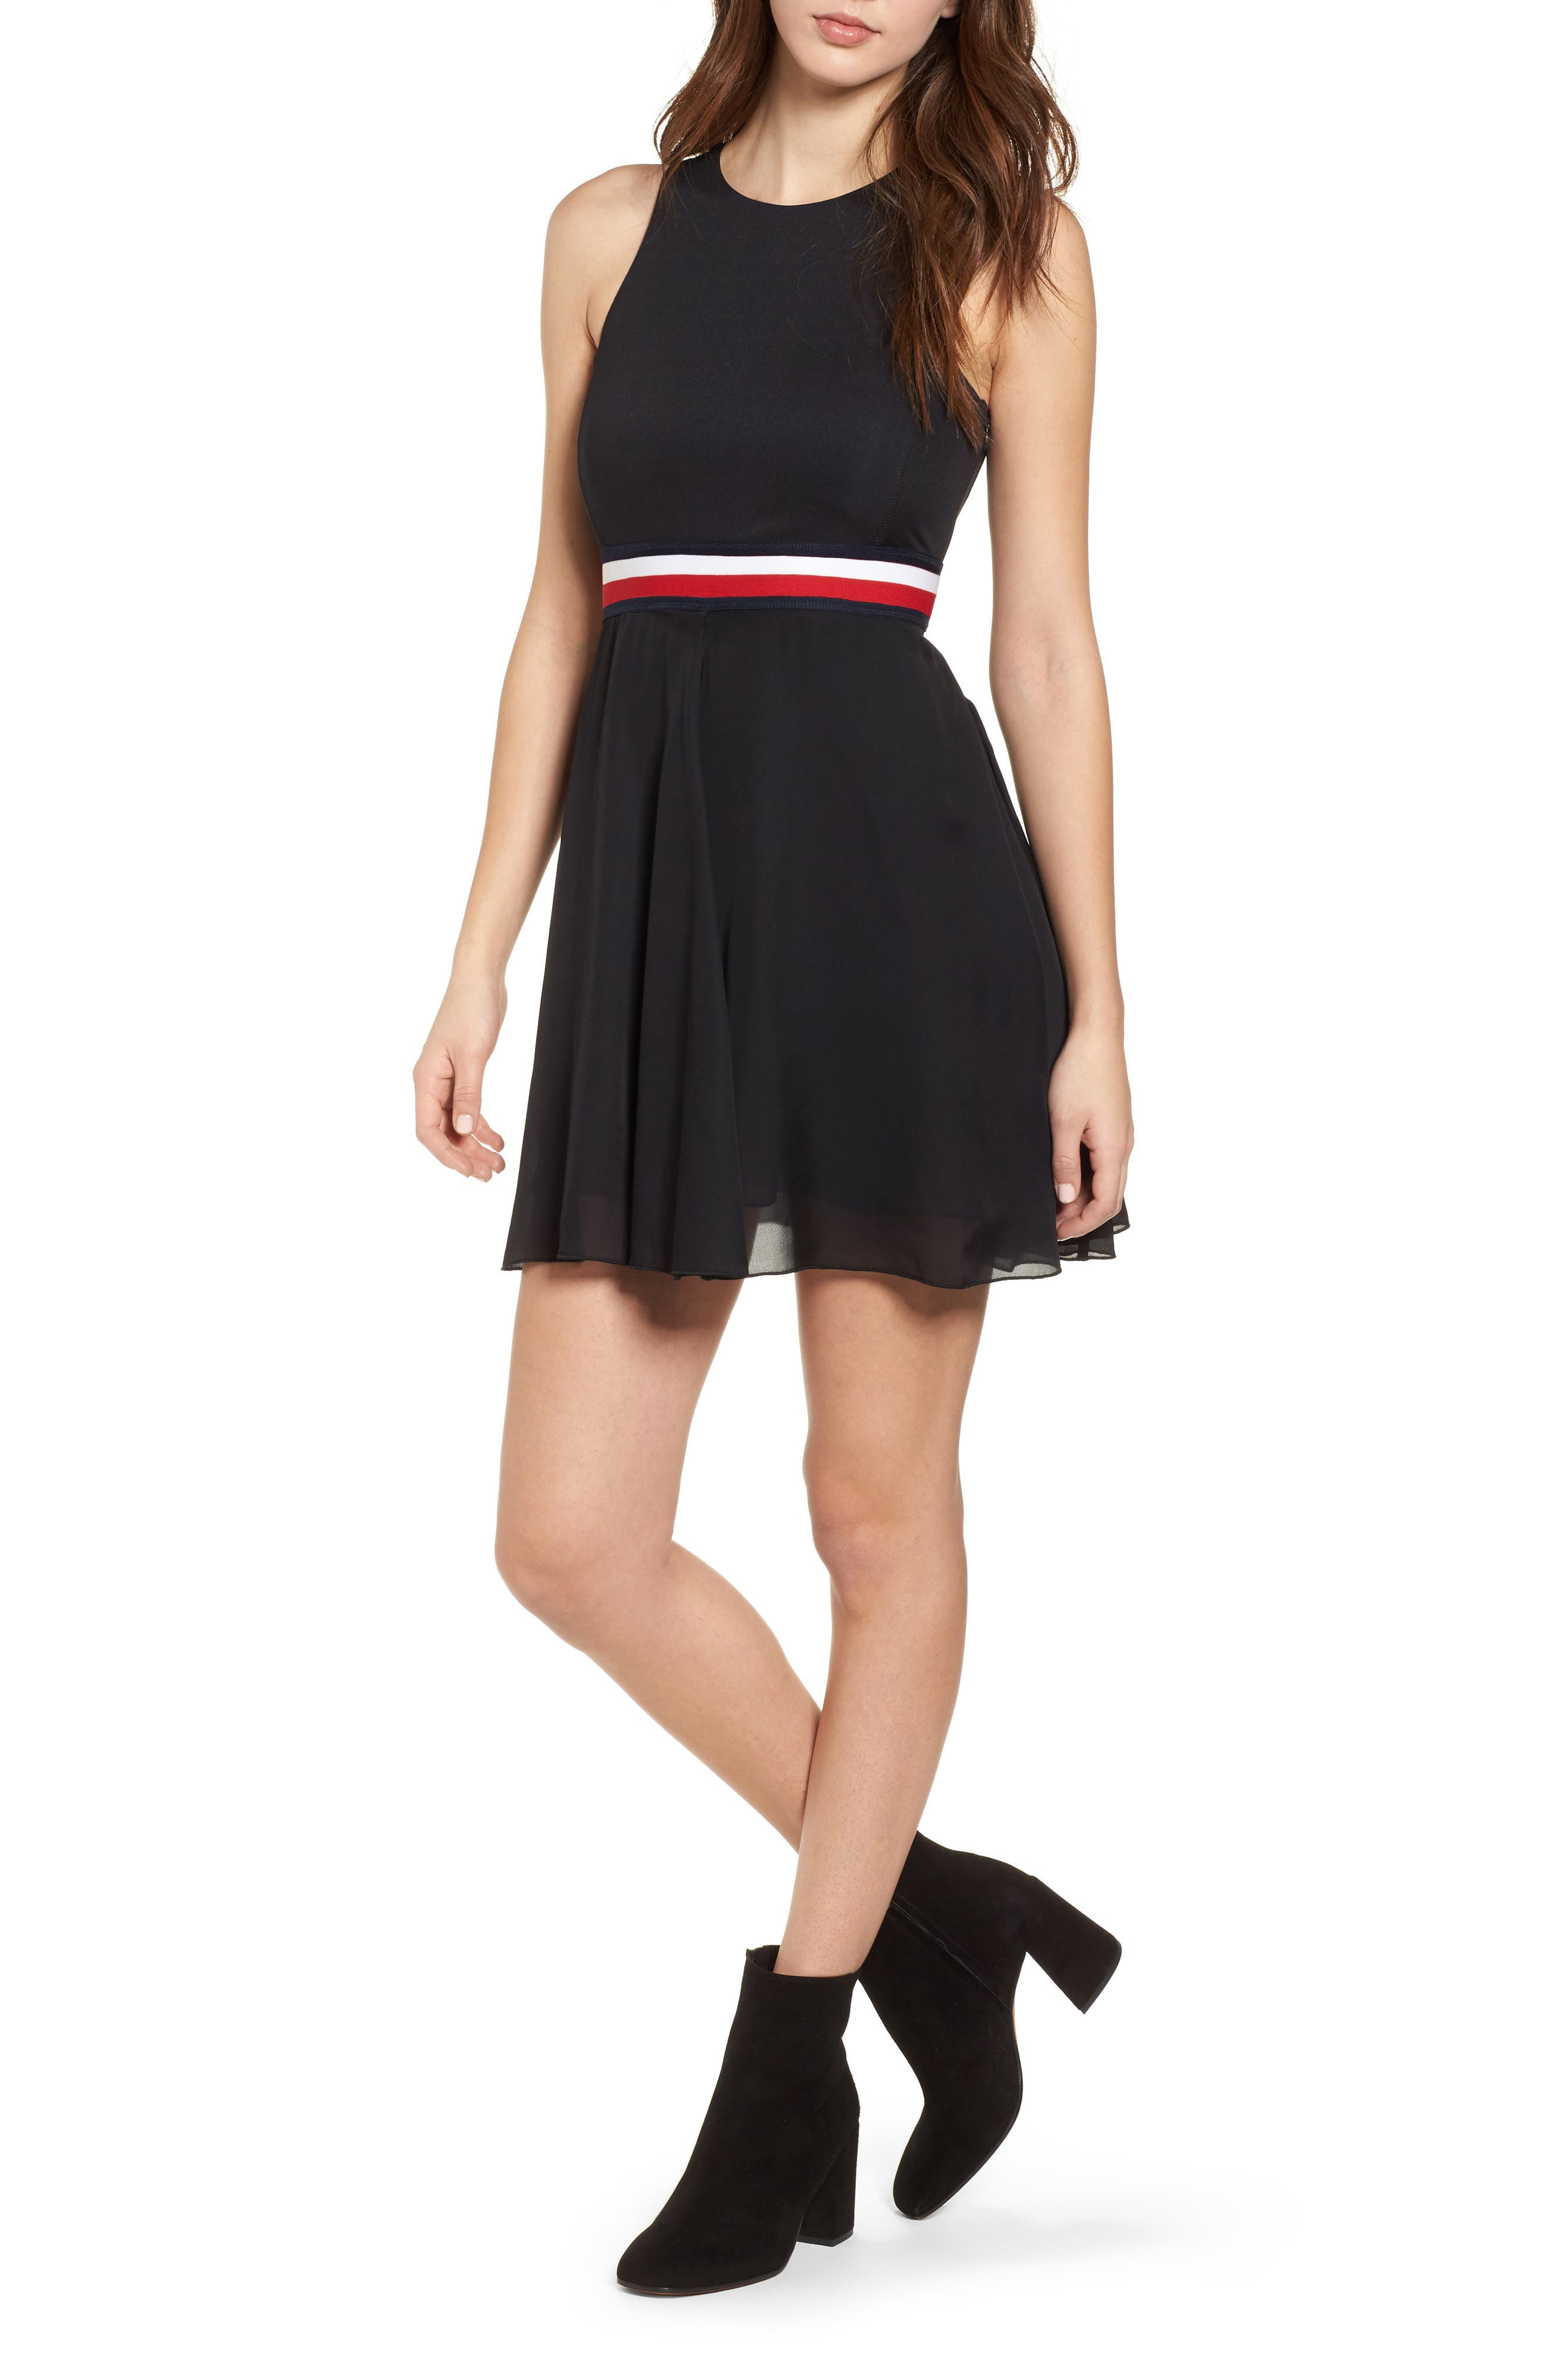 x Gigi Hadid Racerback Dress,                         Main,                         color, 001